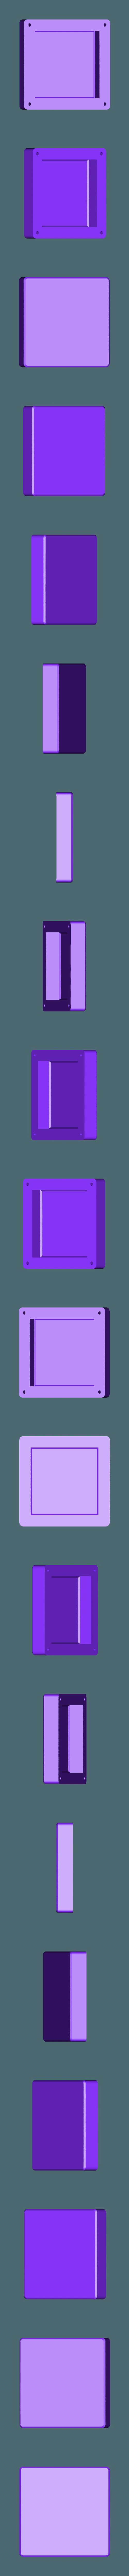 BoxBottom.stl Download STL file Magnetic Escape Room Puzzle Box • Design to 3D print, Osprey